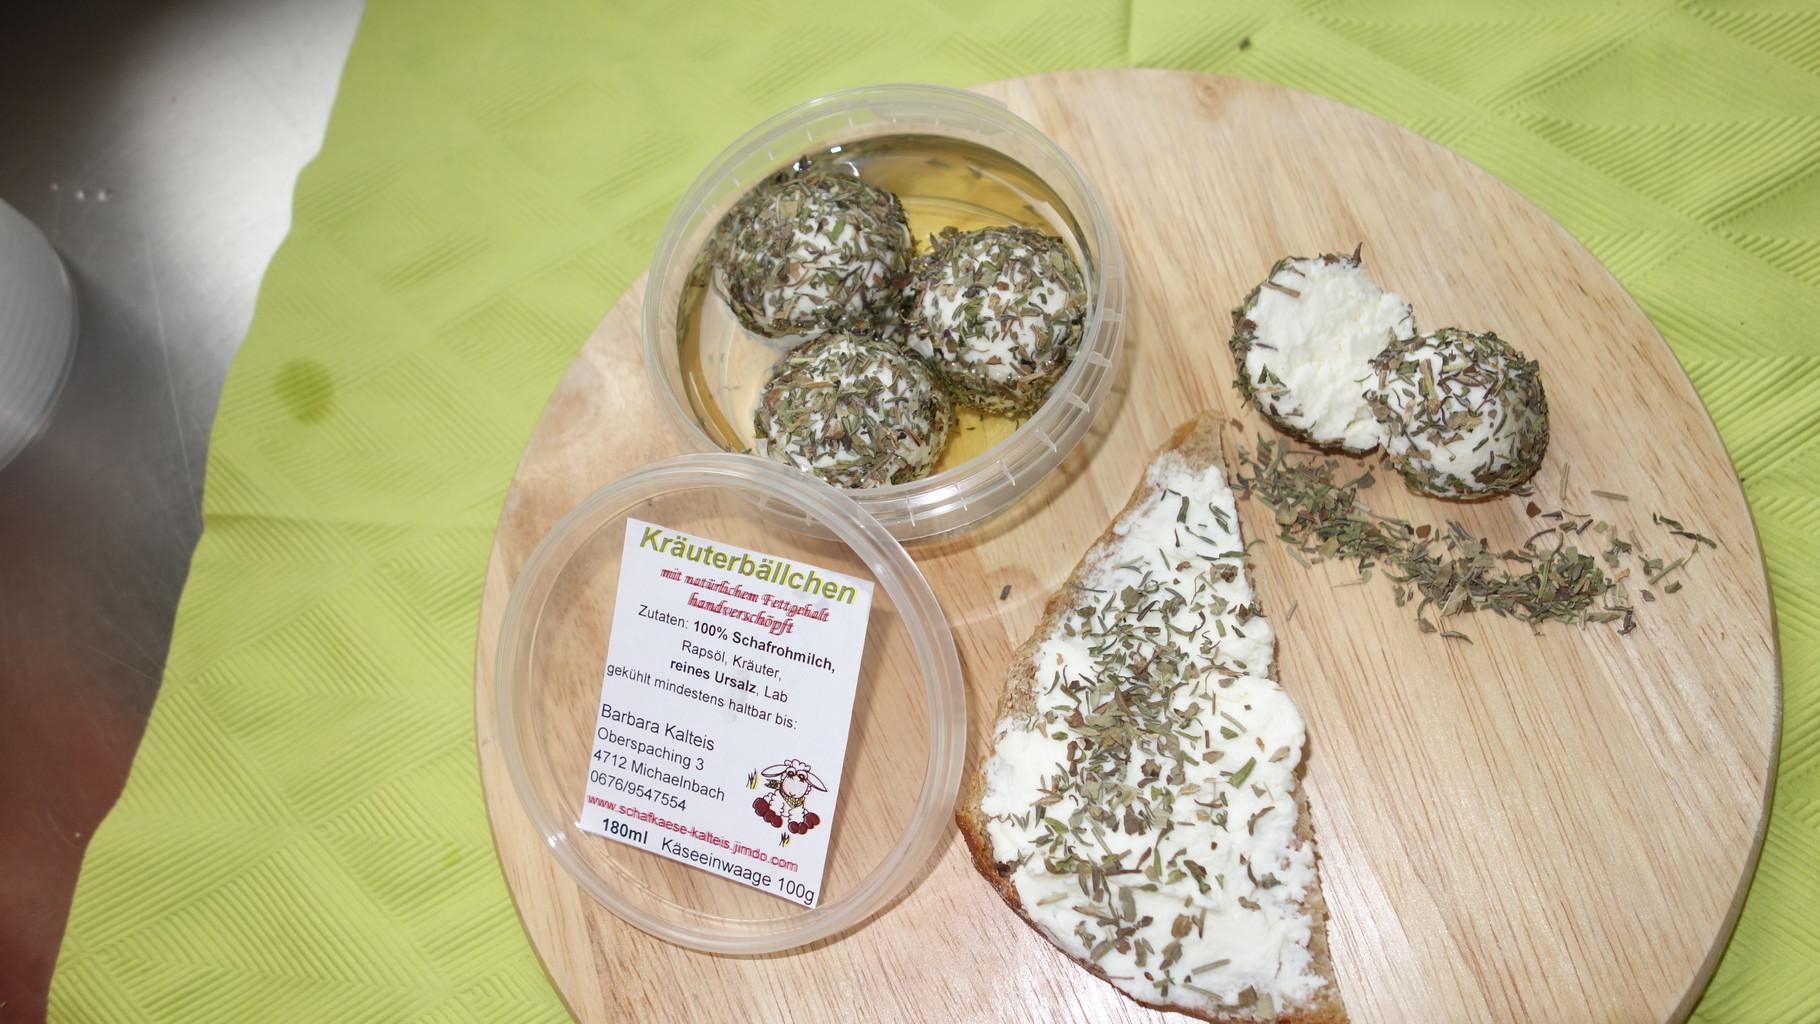 Kräuterbällchen, Frischkäse mit einzigartiger Kräutermischung